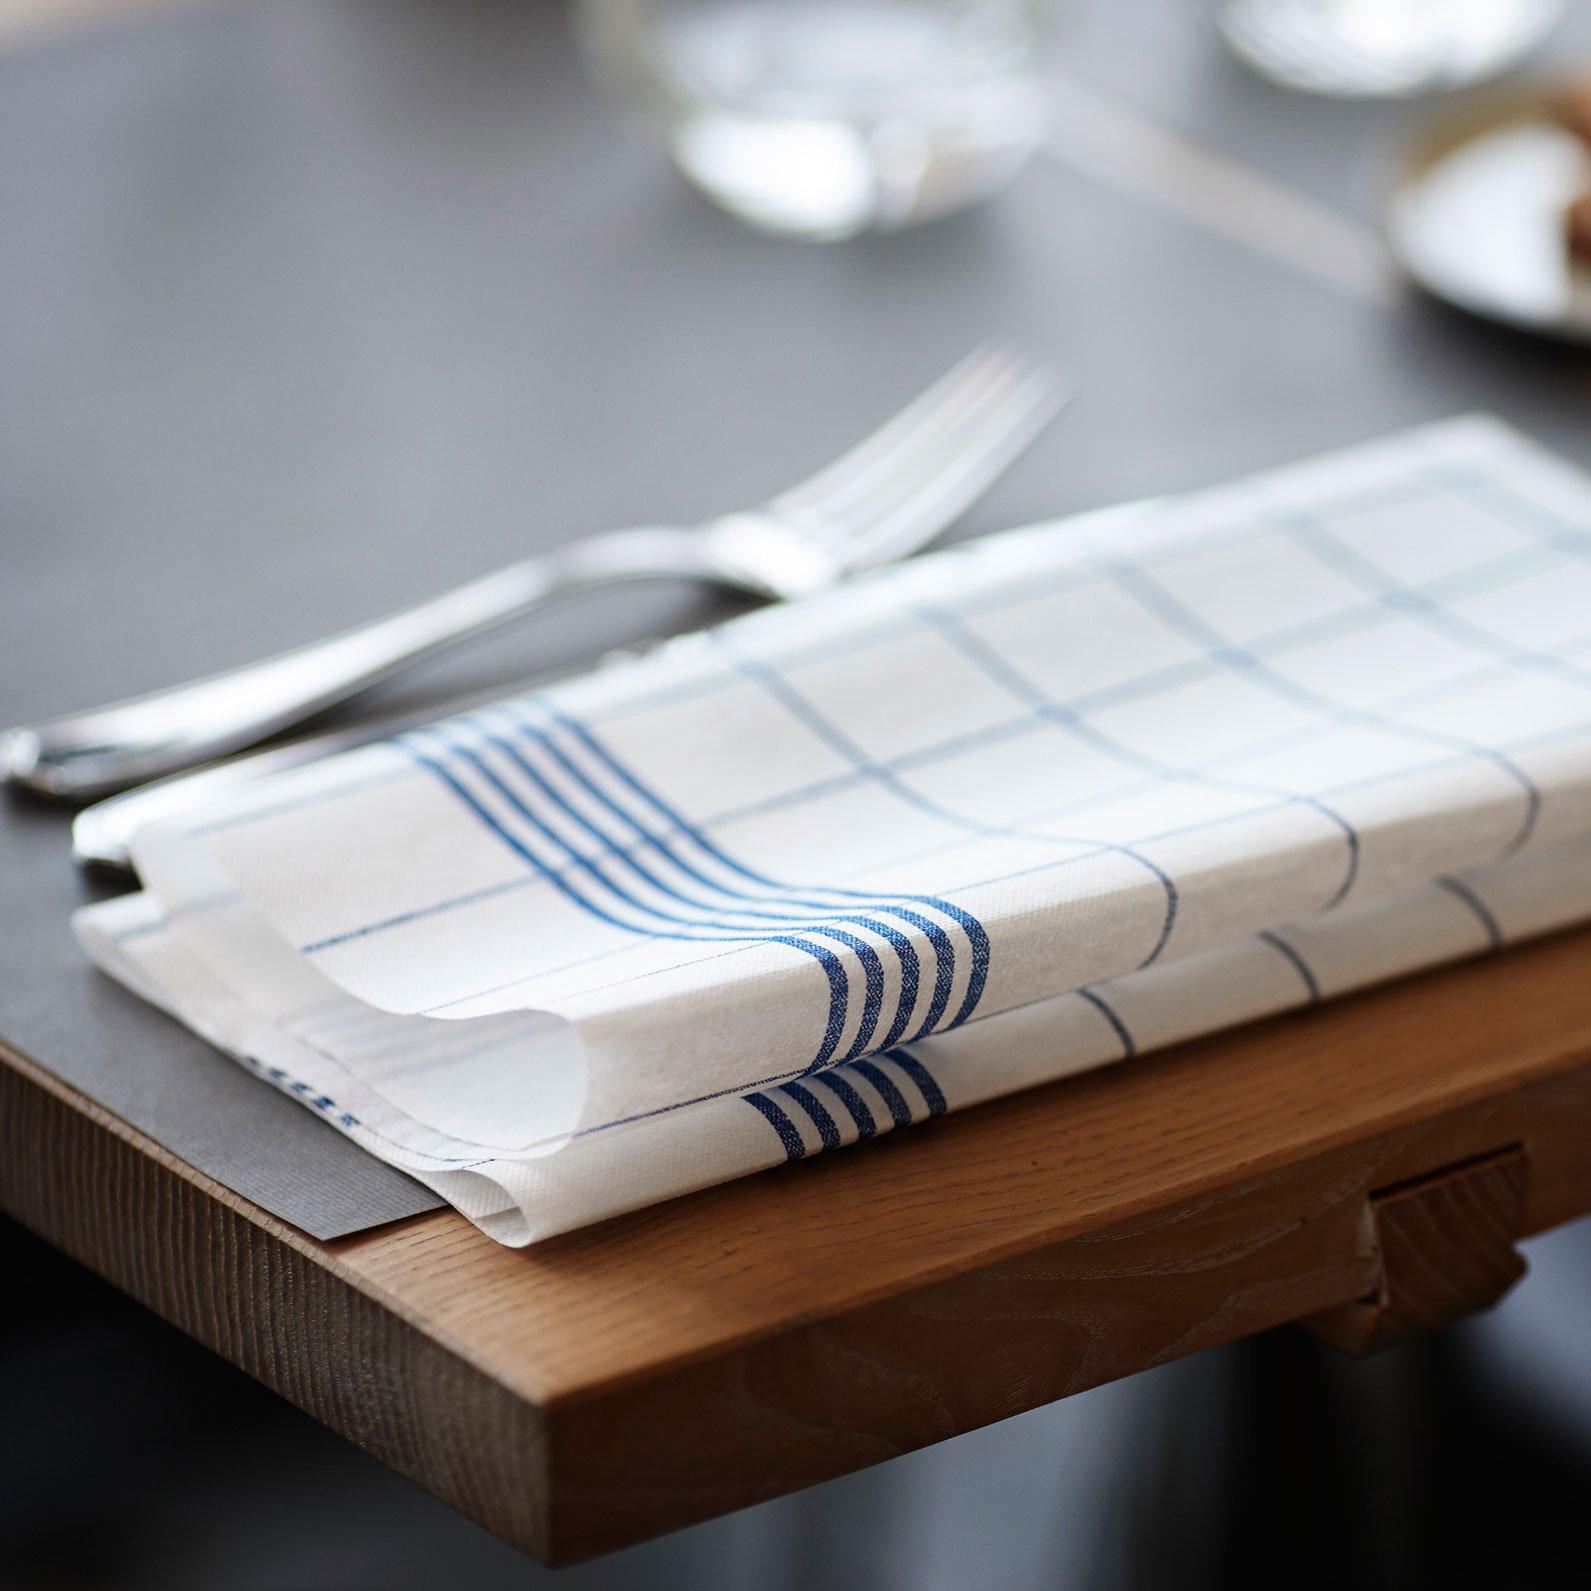 duni-dunicel-servietten-towel-napkin-in-blau-faltenfrei-38-x-54-cm